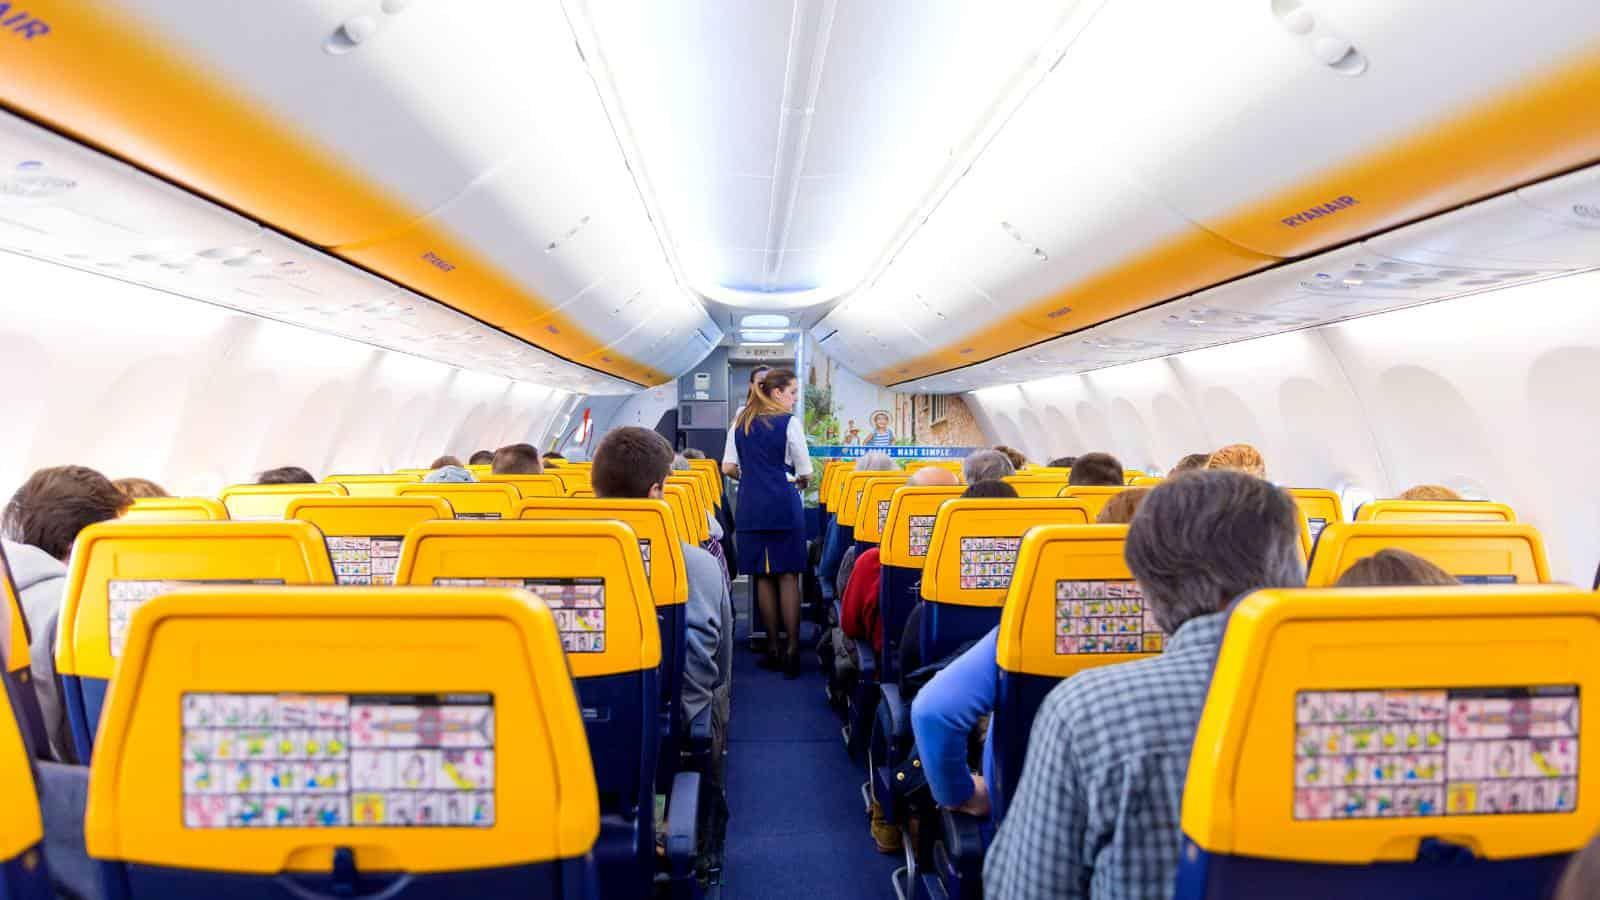 Vola gratis Ryanair biglietti 2 x 1